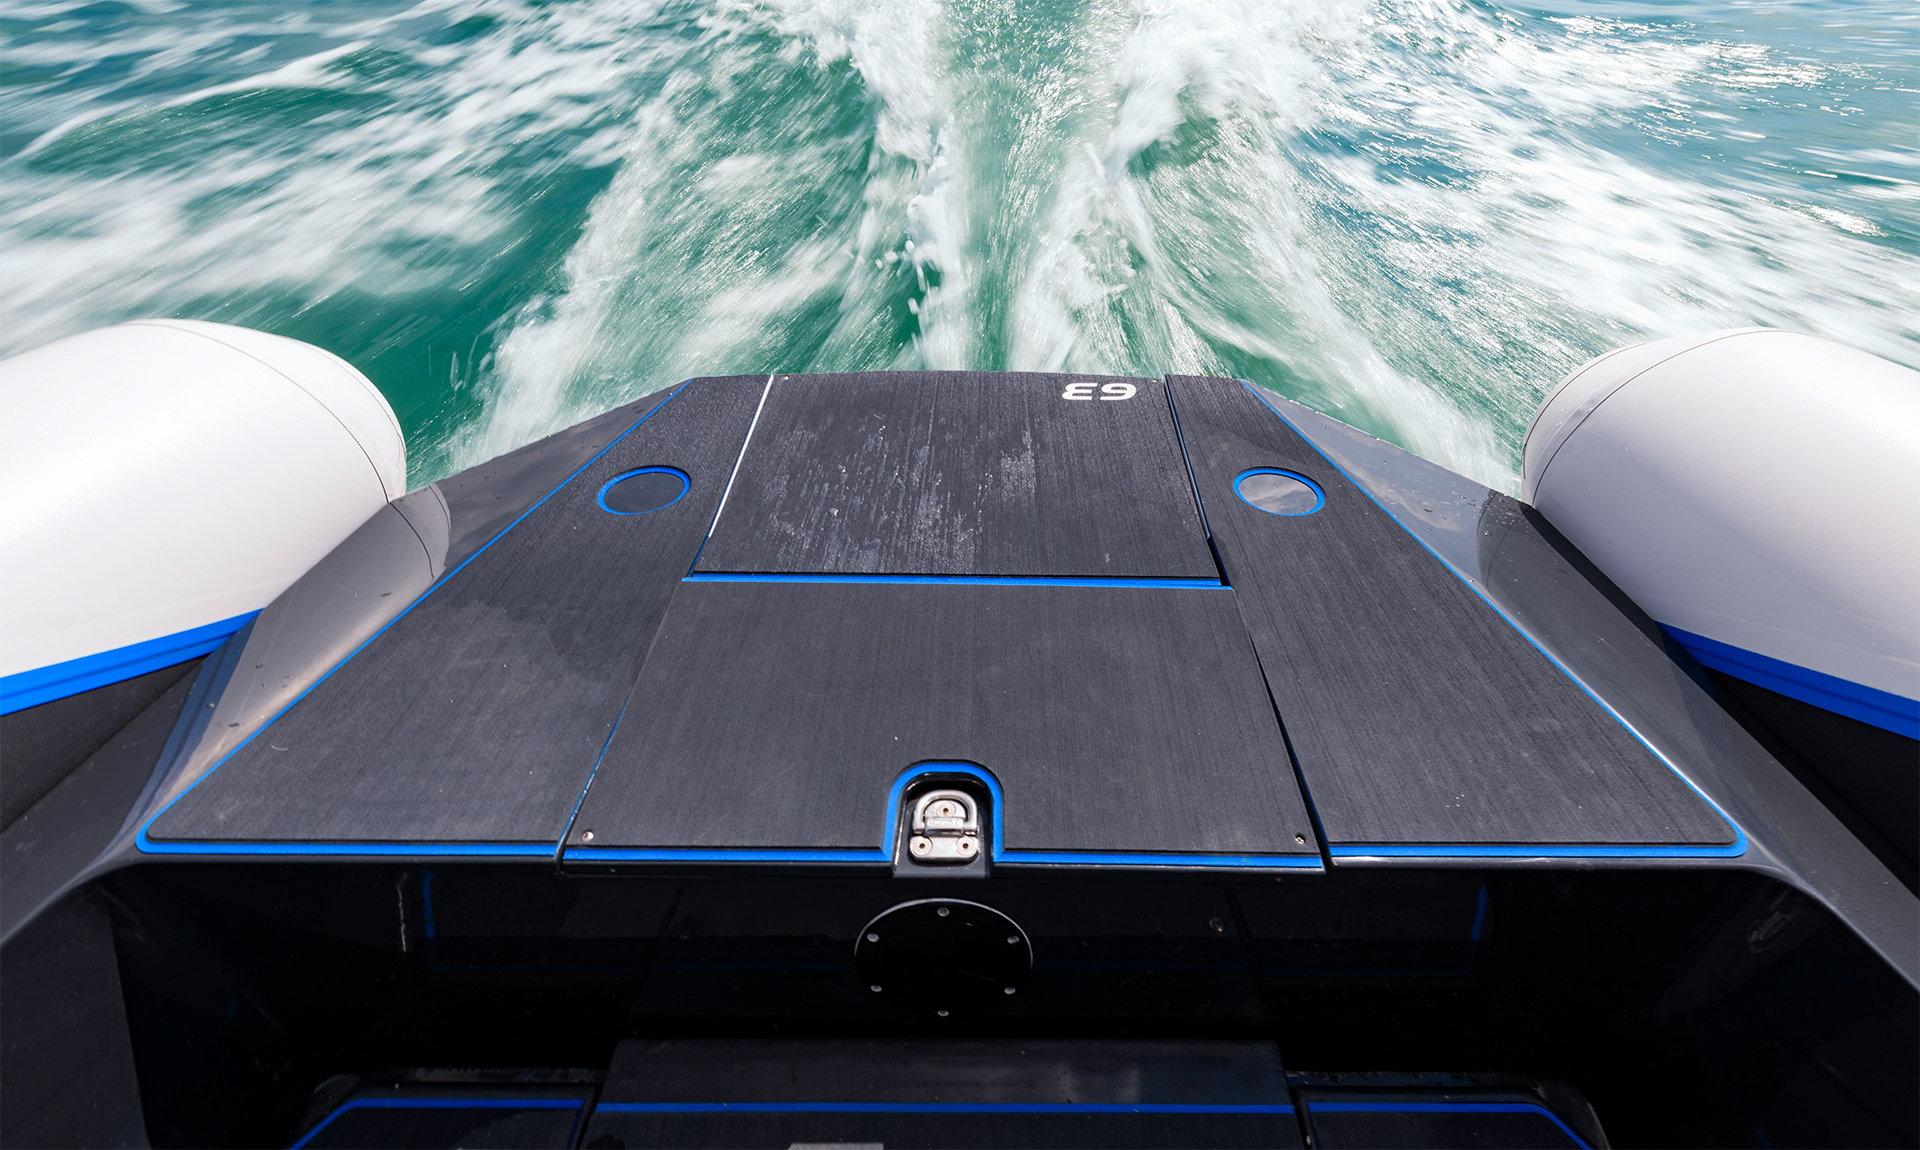 Pulse 63 RIB - RS Electric Boats - Propulsion